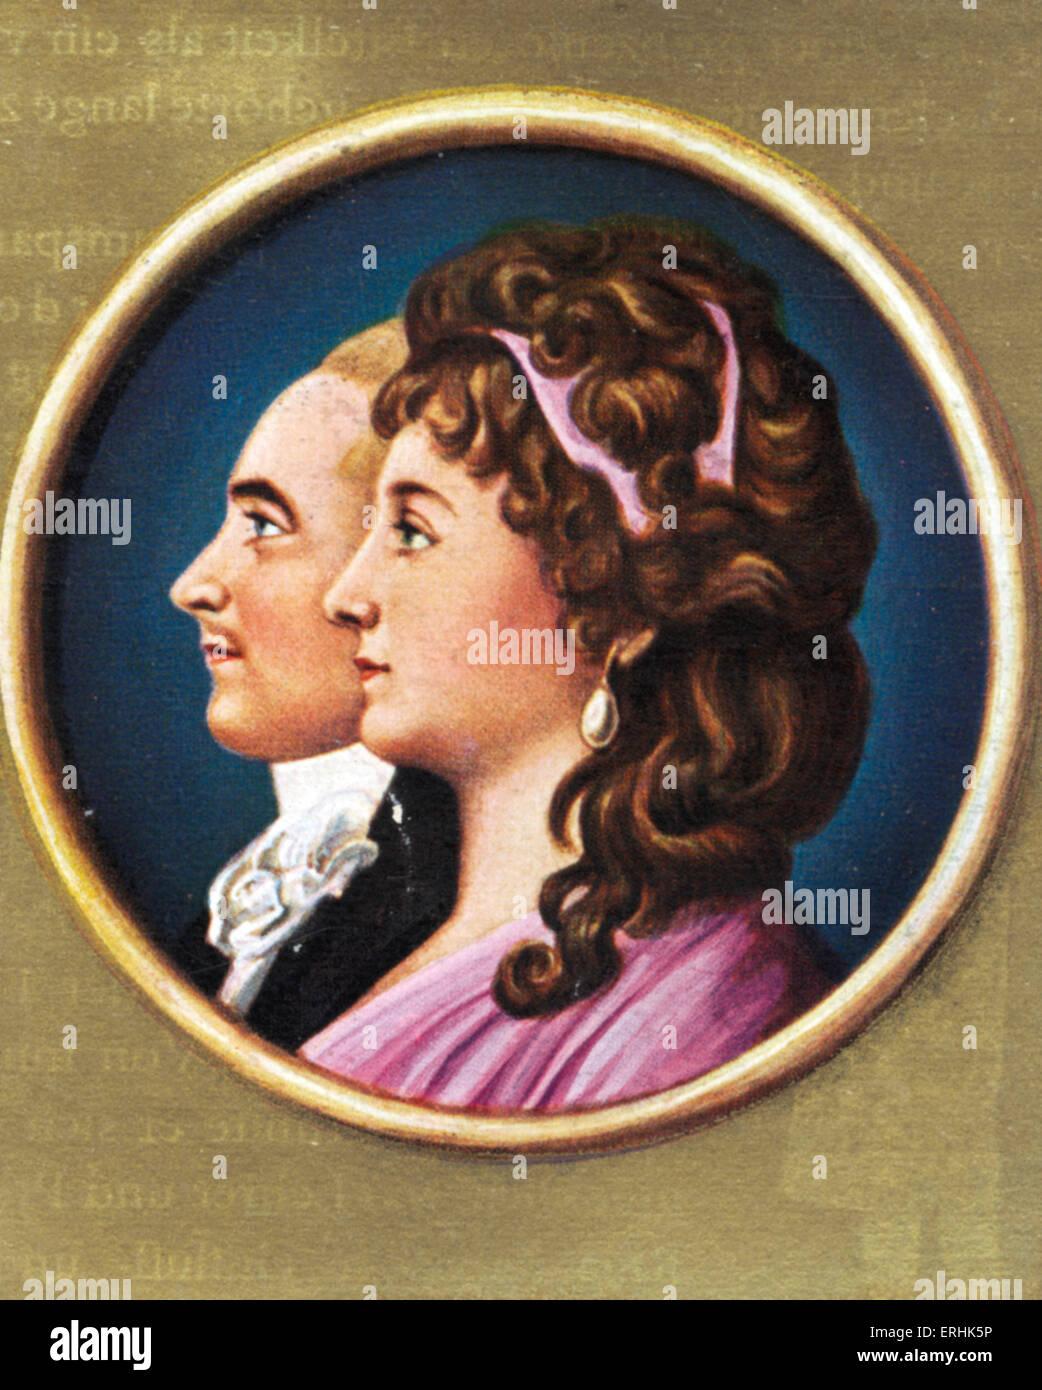 Lili Schonemann and her husband. Portrait. She was the estranged lover of German writer Johann Wolfgang von Goethe. - Stock Image